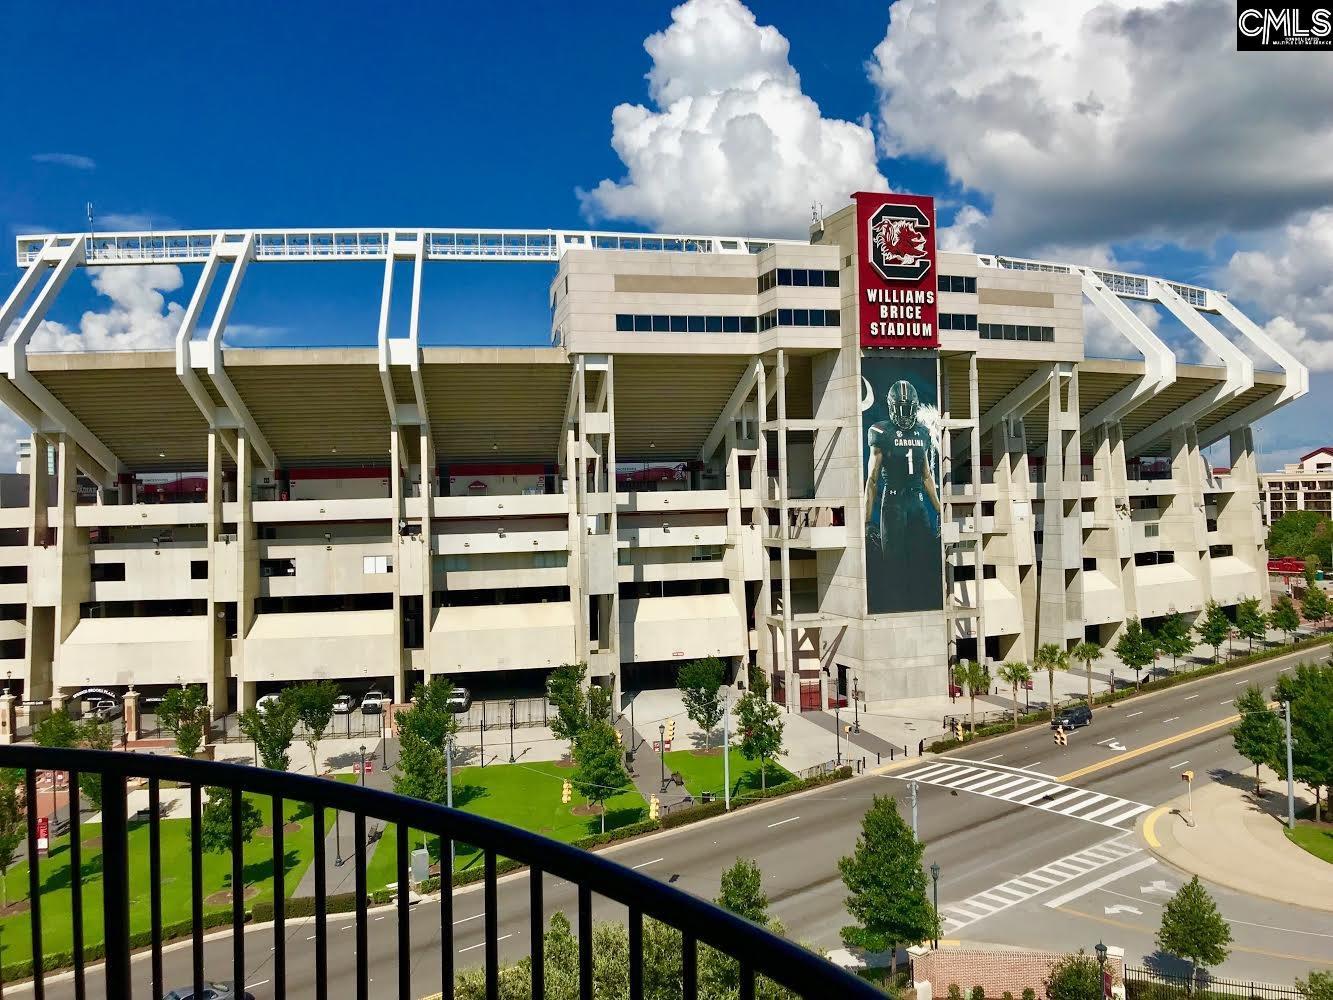 900 S Stadium N713 #N713 Columbia, SC 29201